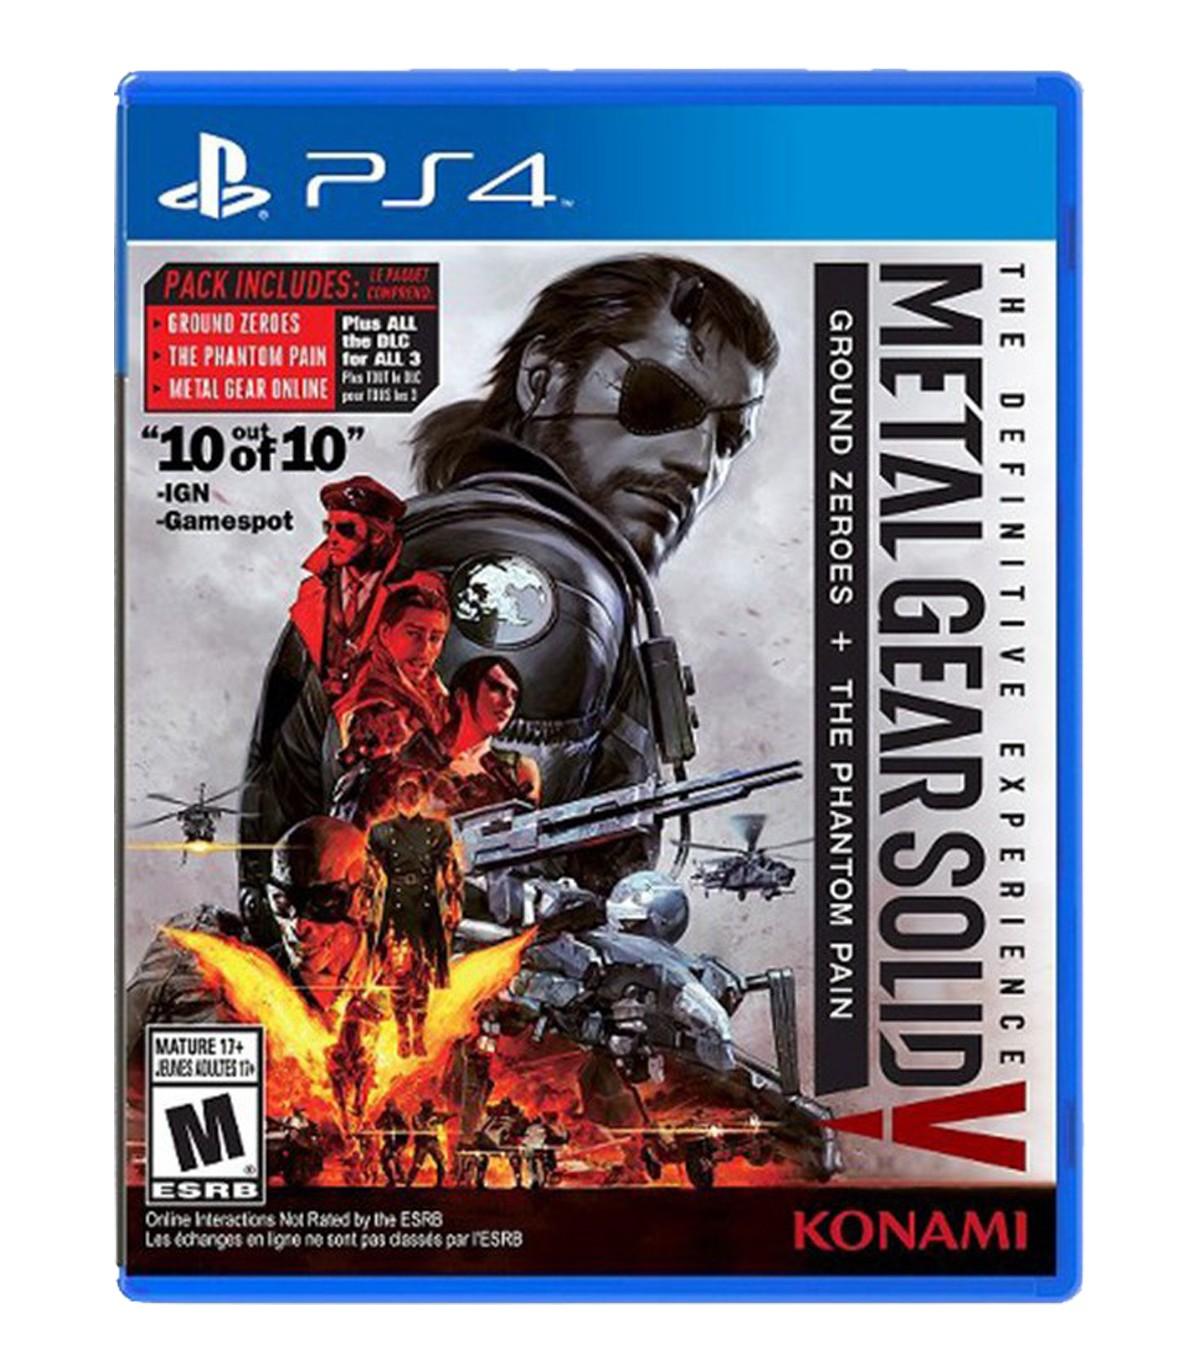 بازی Metal Gear Solid V: The Definitive Experience کارکرده - پلی استیشن 4